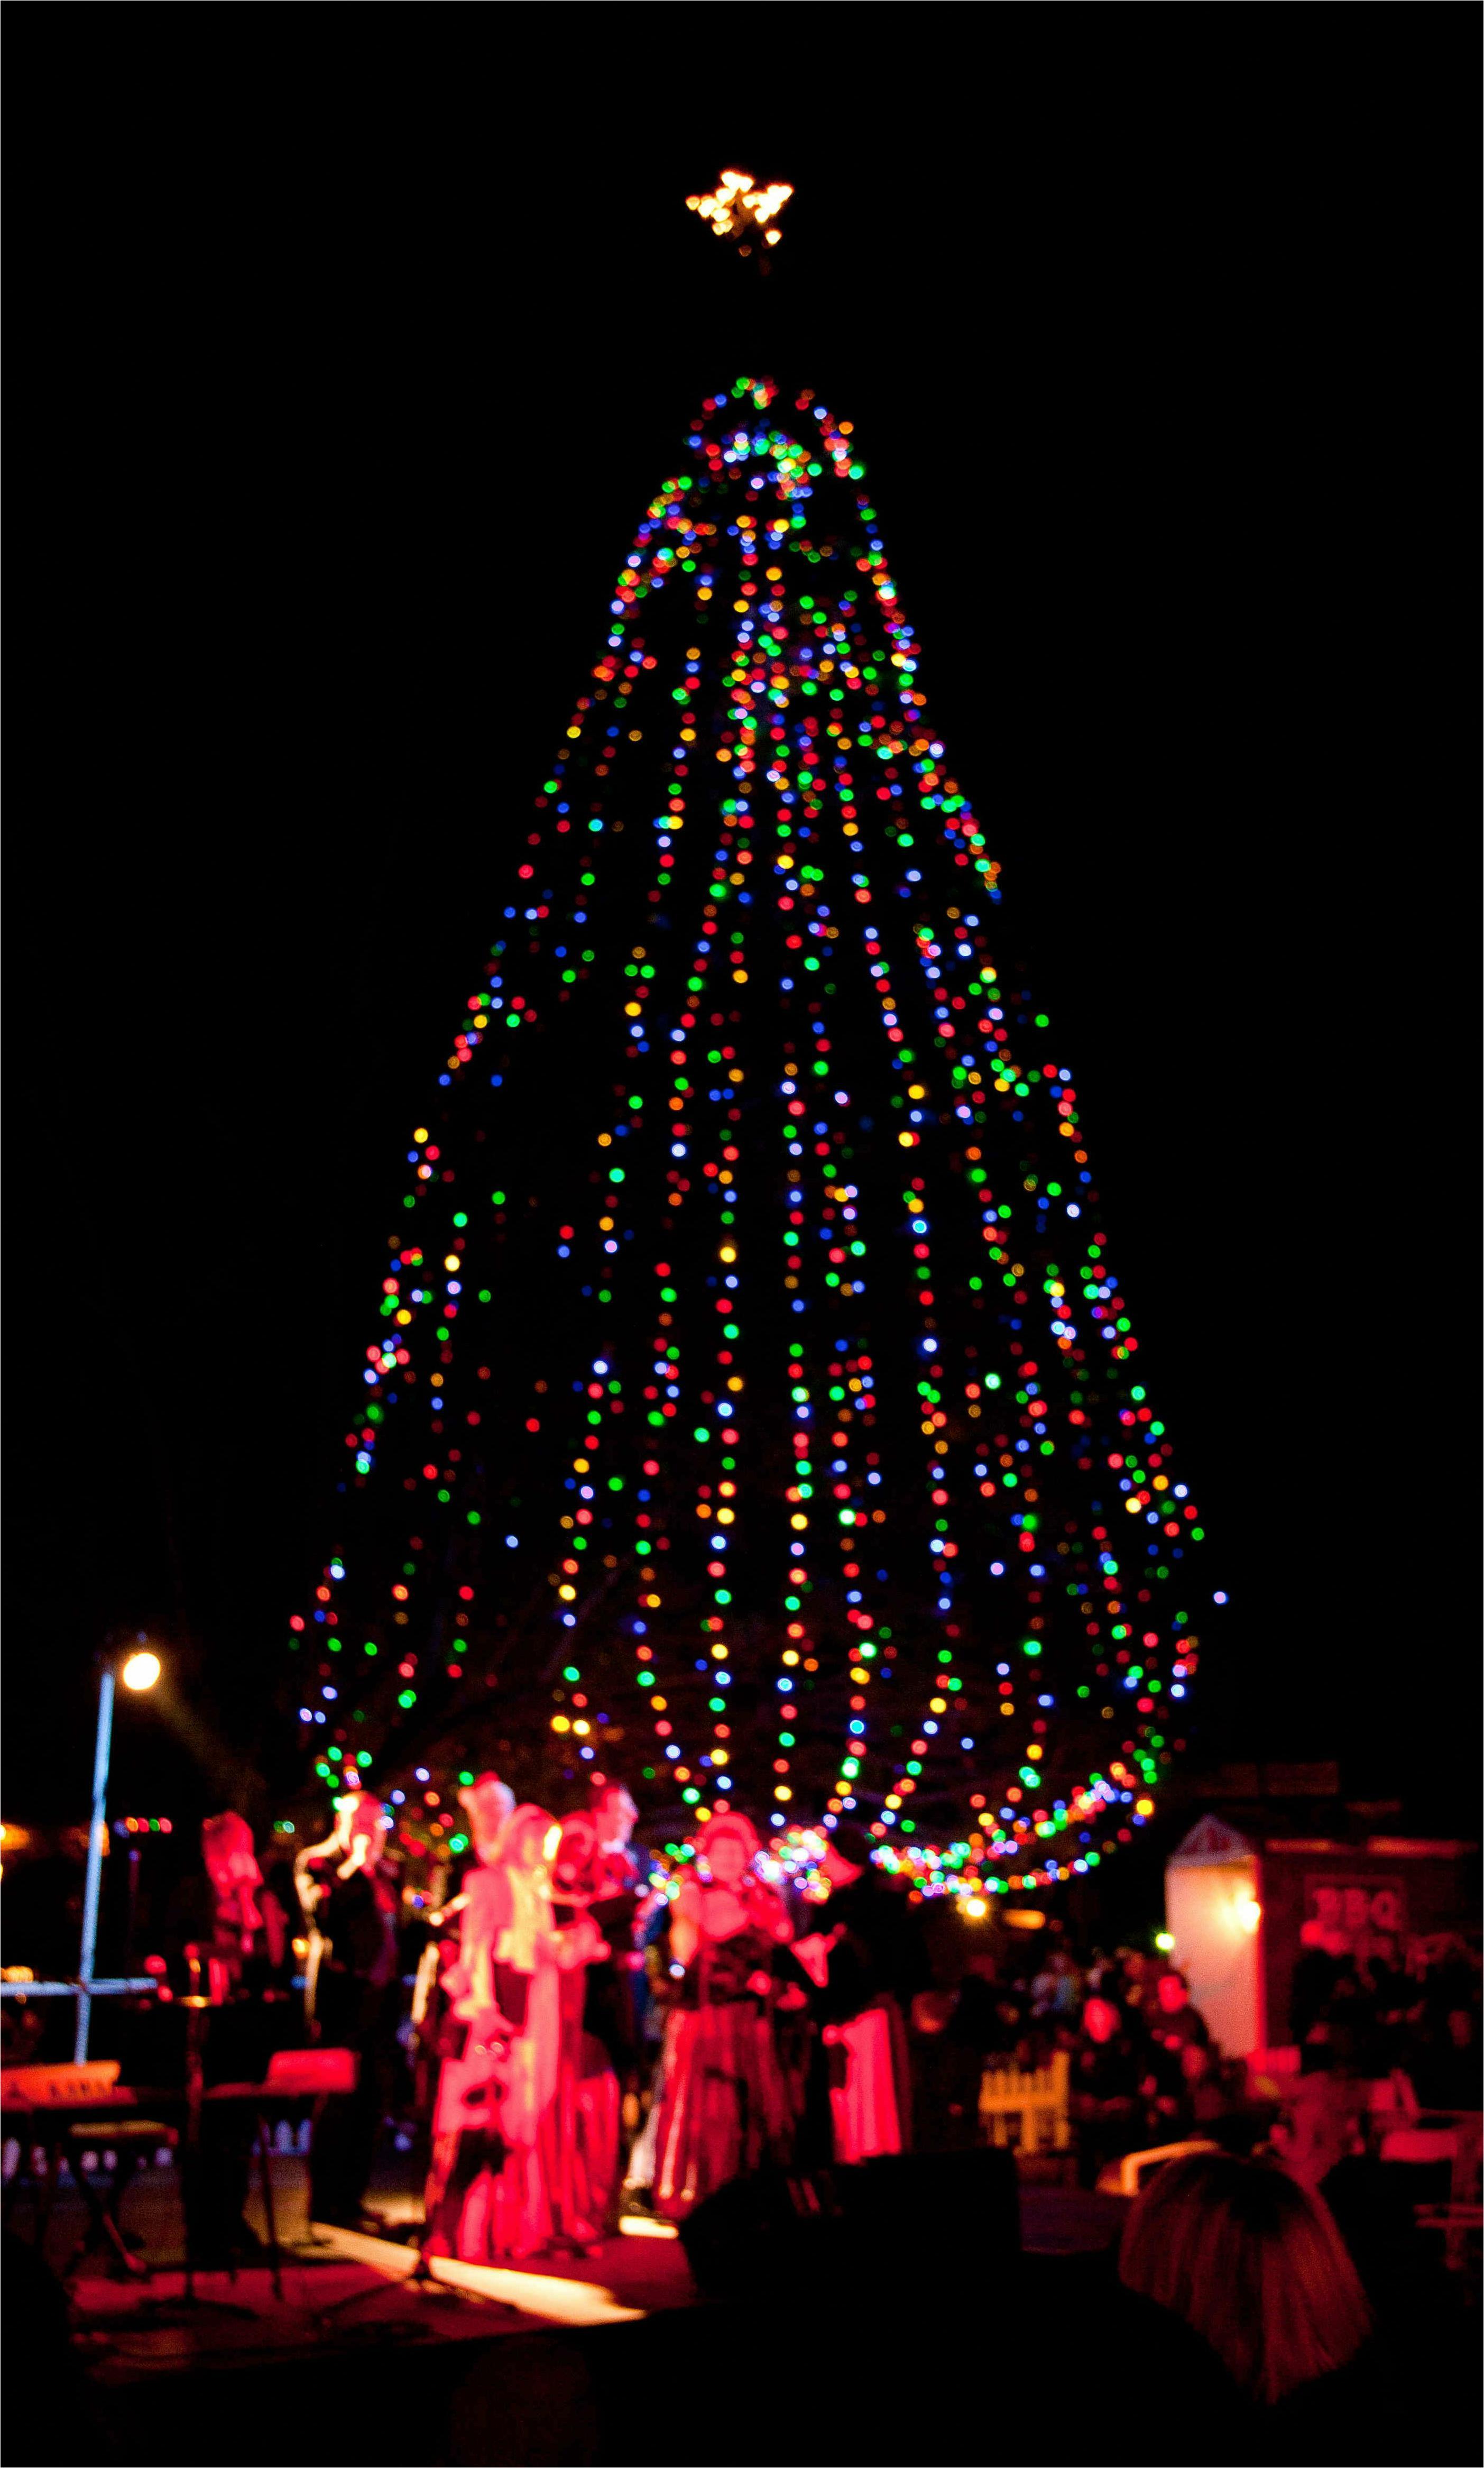 Idyllwilds 54th Annual Christmas Tree Lighting Ceremony